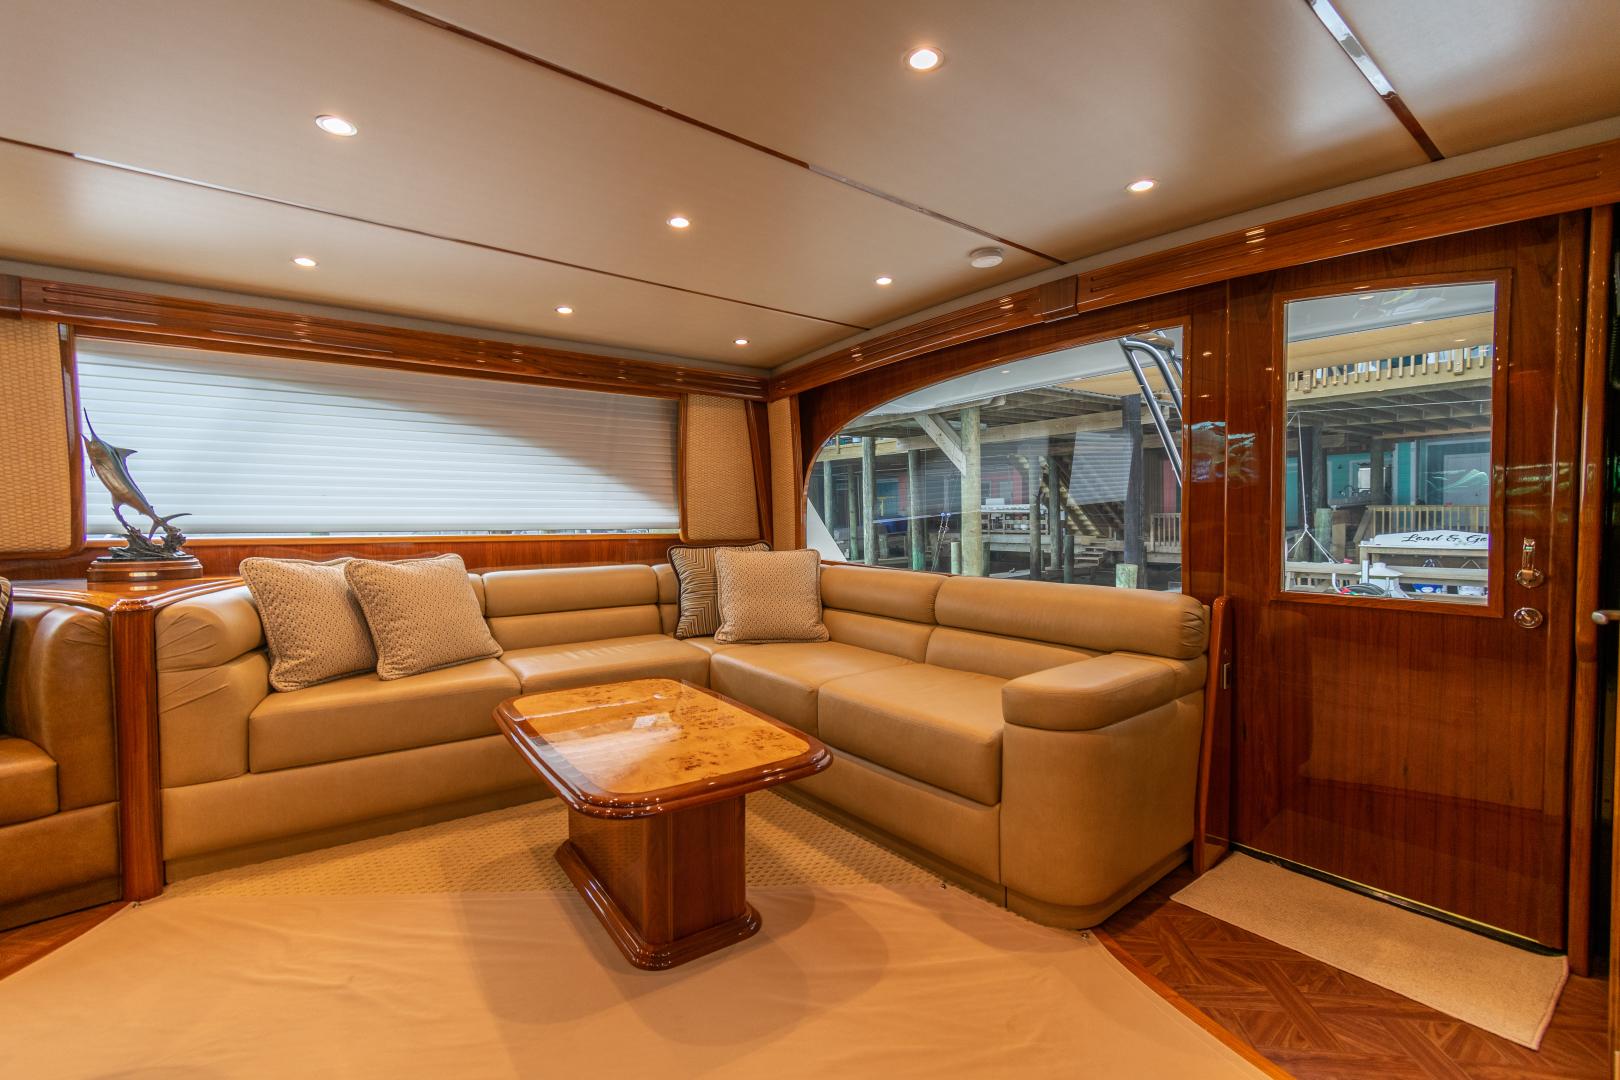 Viking-70 Convertible 2014-Load N Go Port Aransas-Texas-United States-2014 70 Viking Load N Go Salon (4)-1380505 | Thumbnail